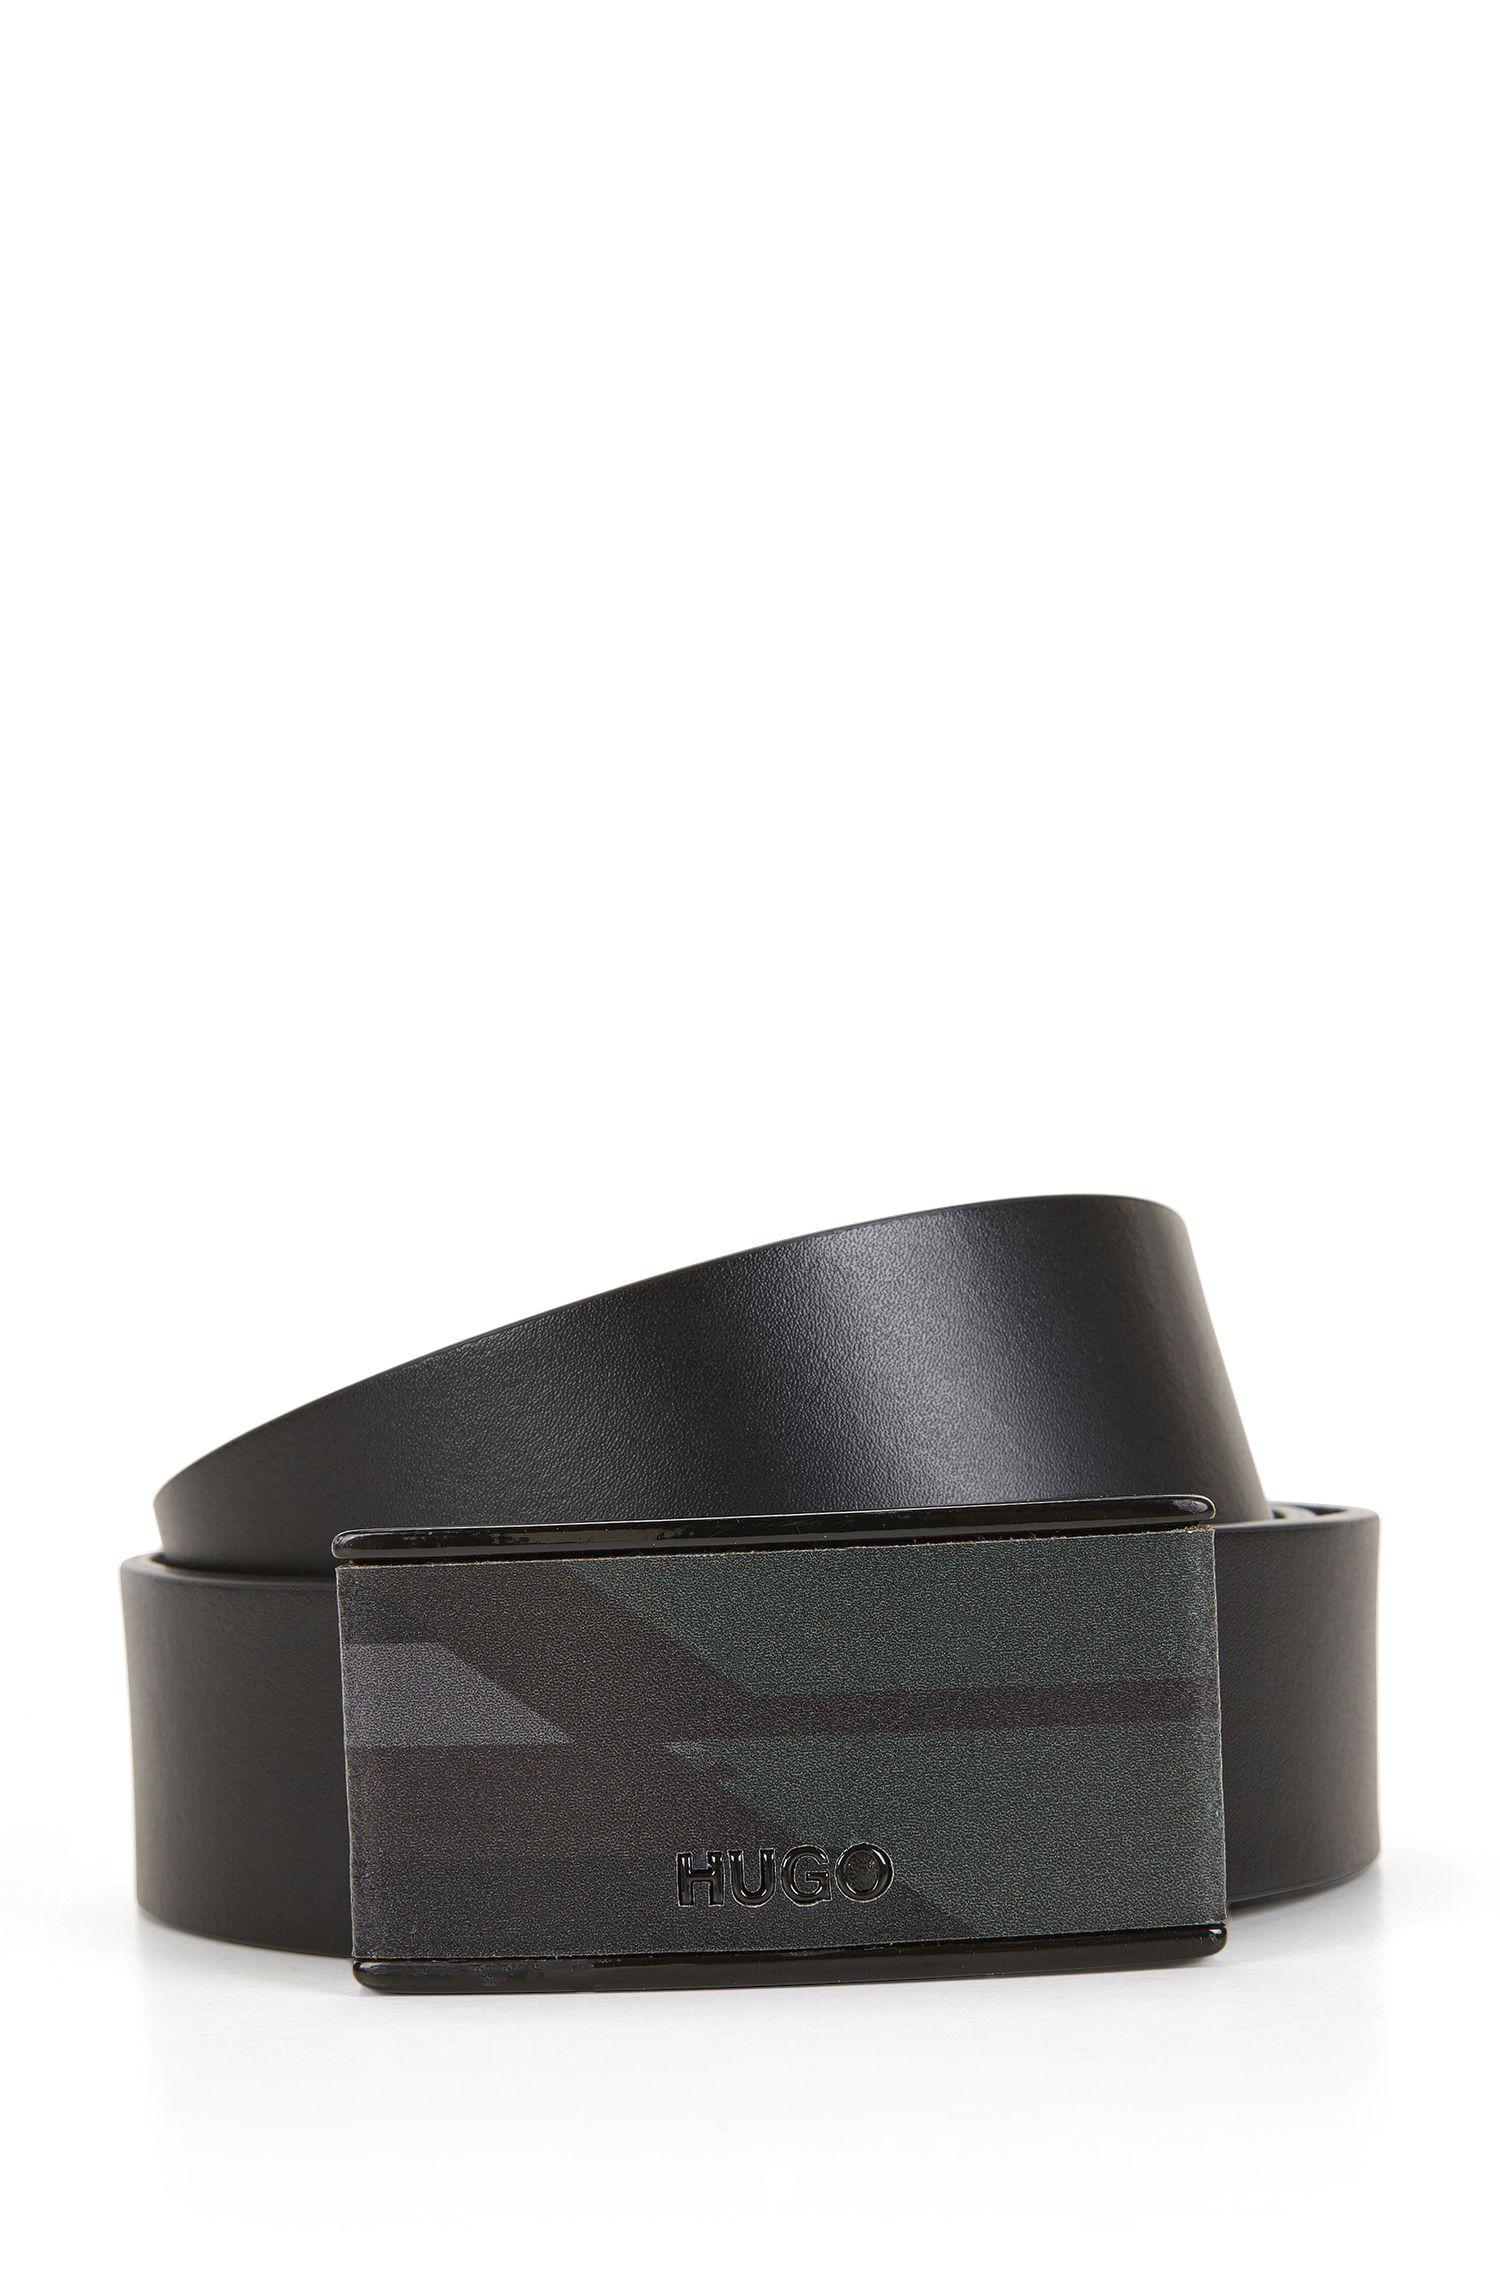 Leather Belt | Gerdy Sz Ltca, Black